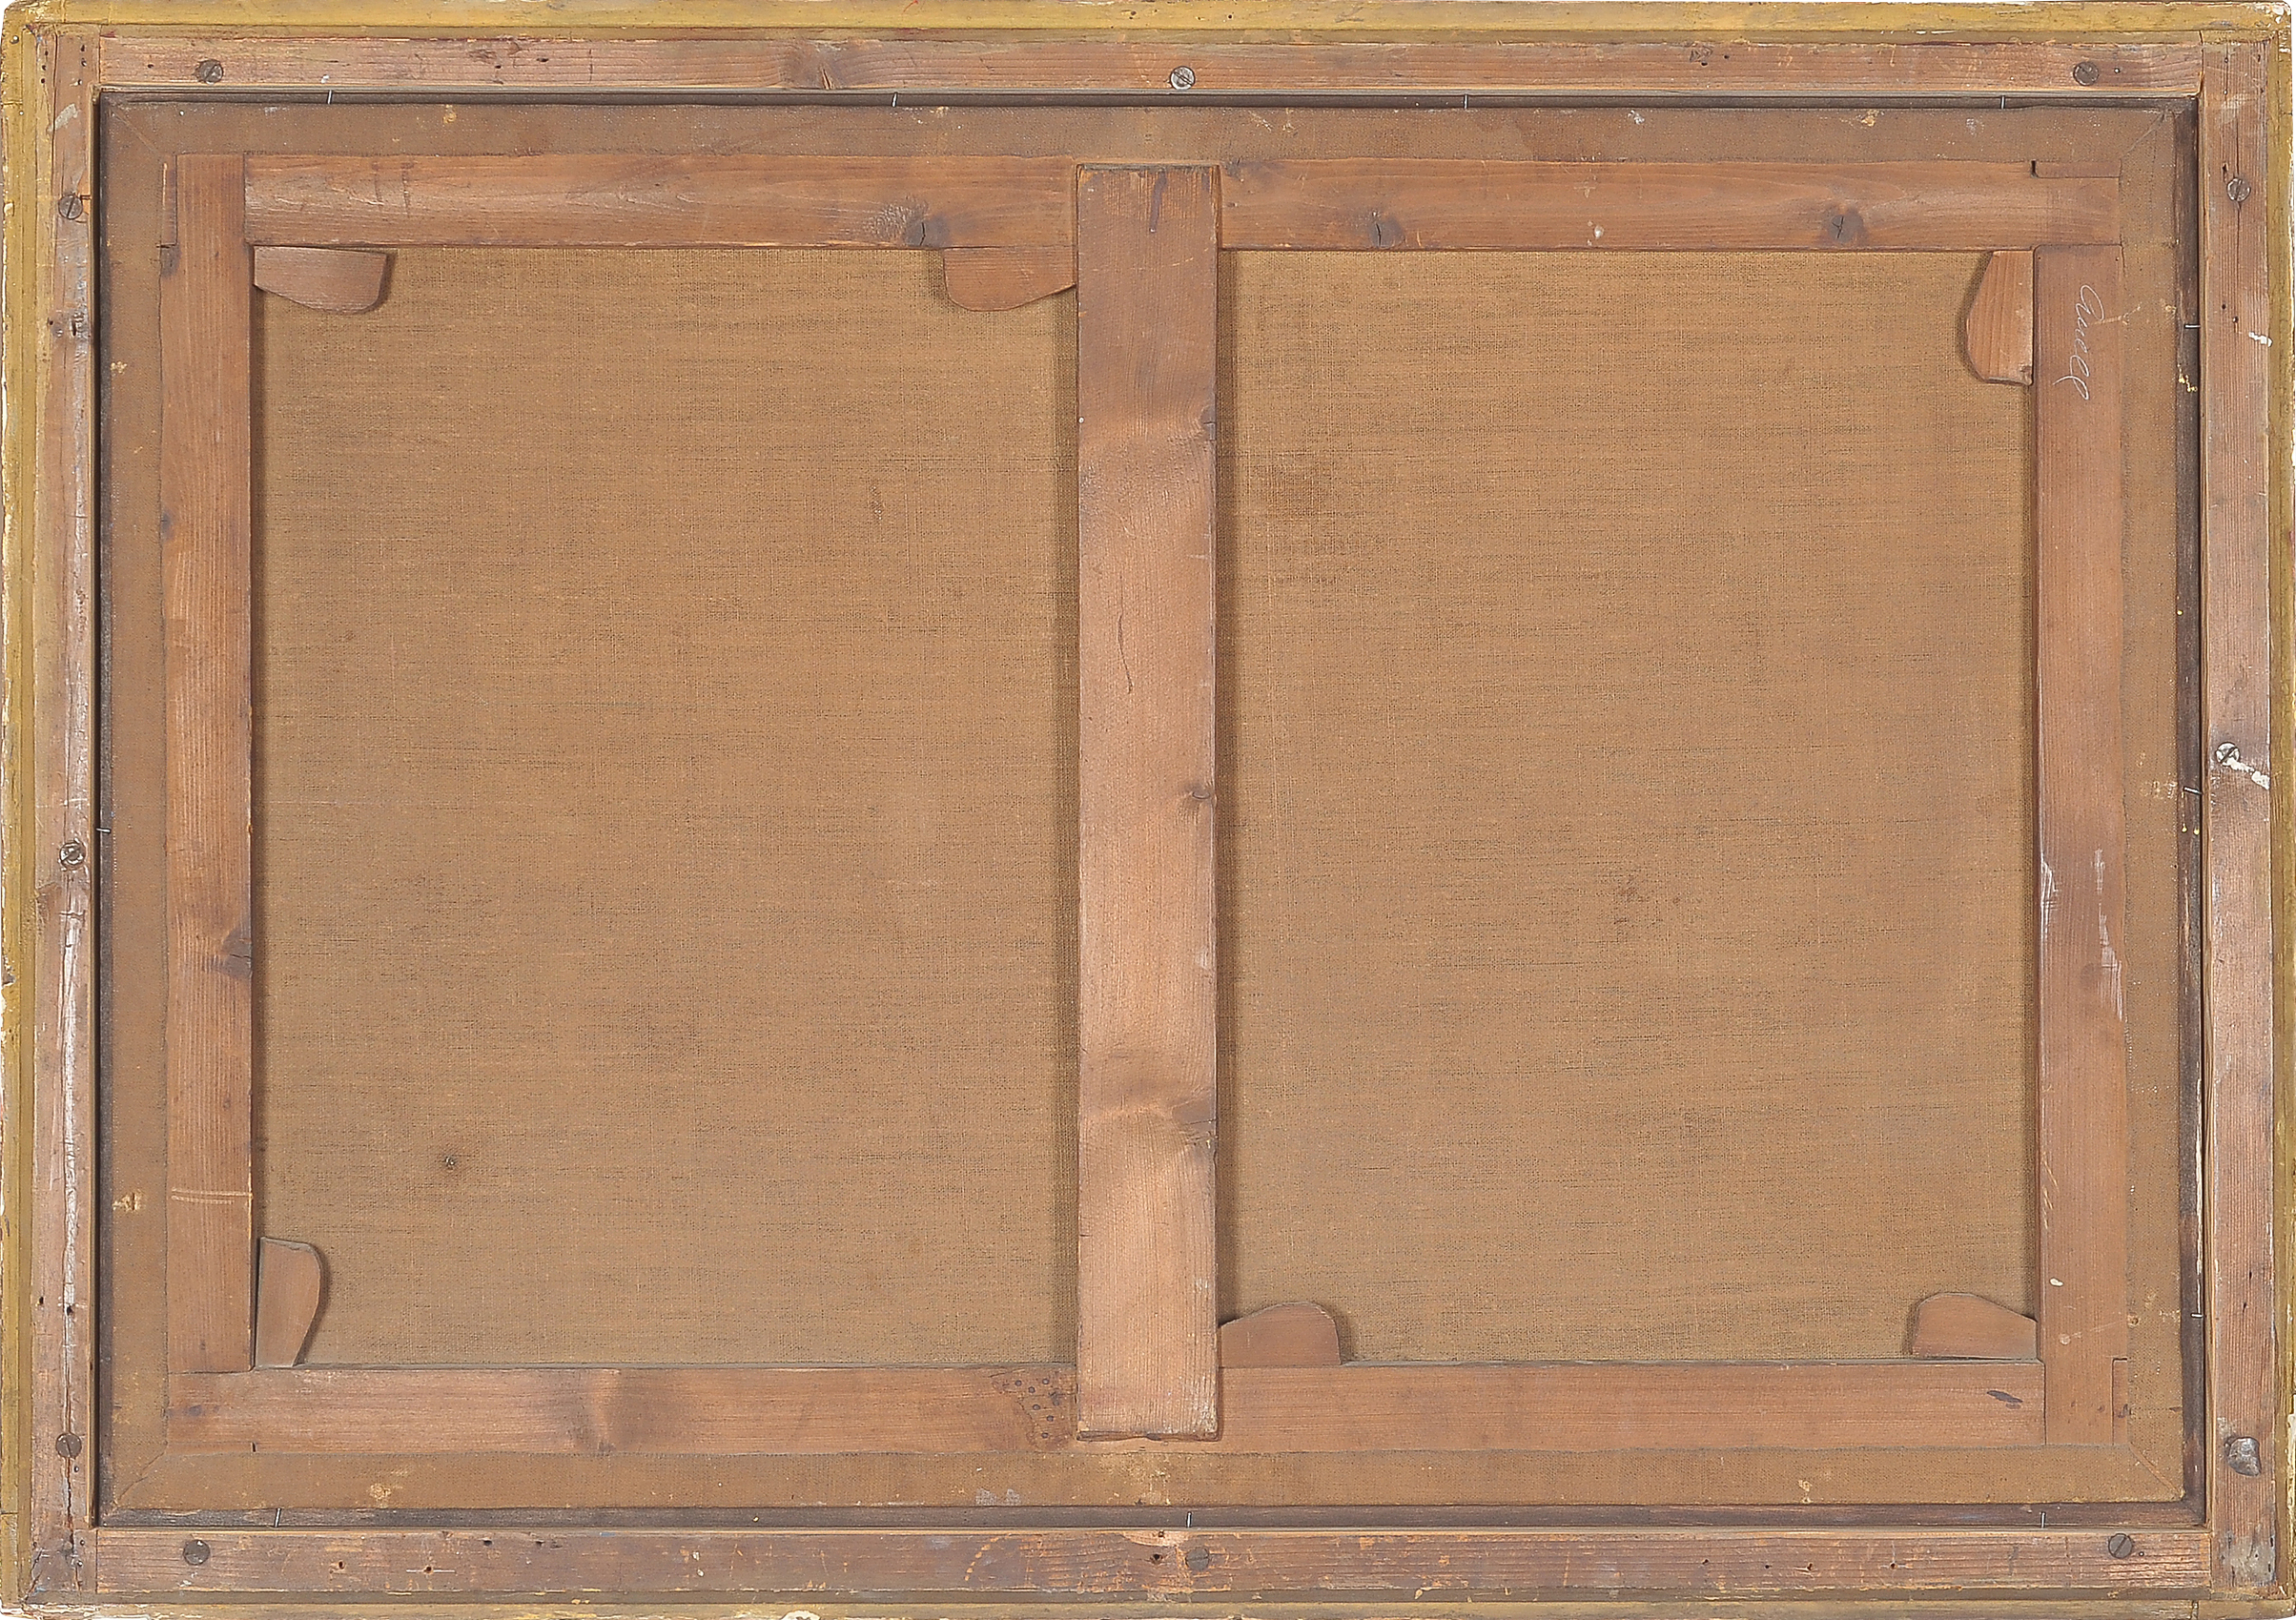 Cajetan Roos, detto Gaetano de Rosa, Rom 1690 – 1770 Wien, Arche Noah - Image 7 of 7